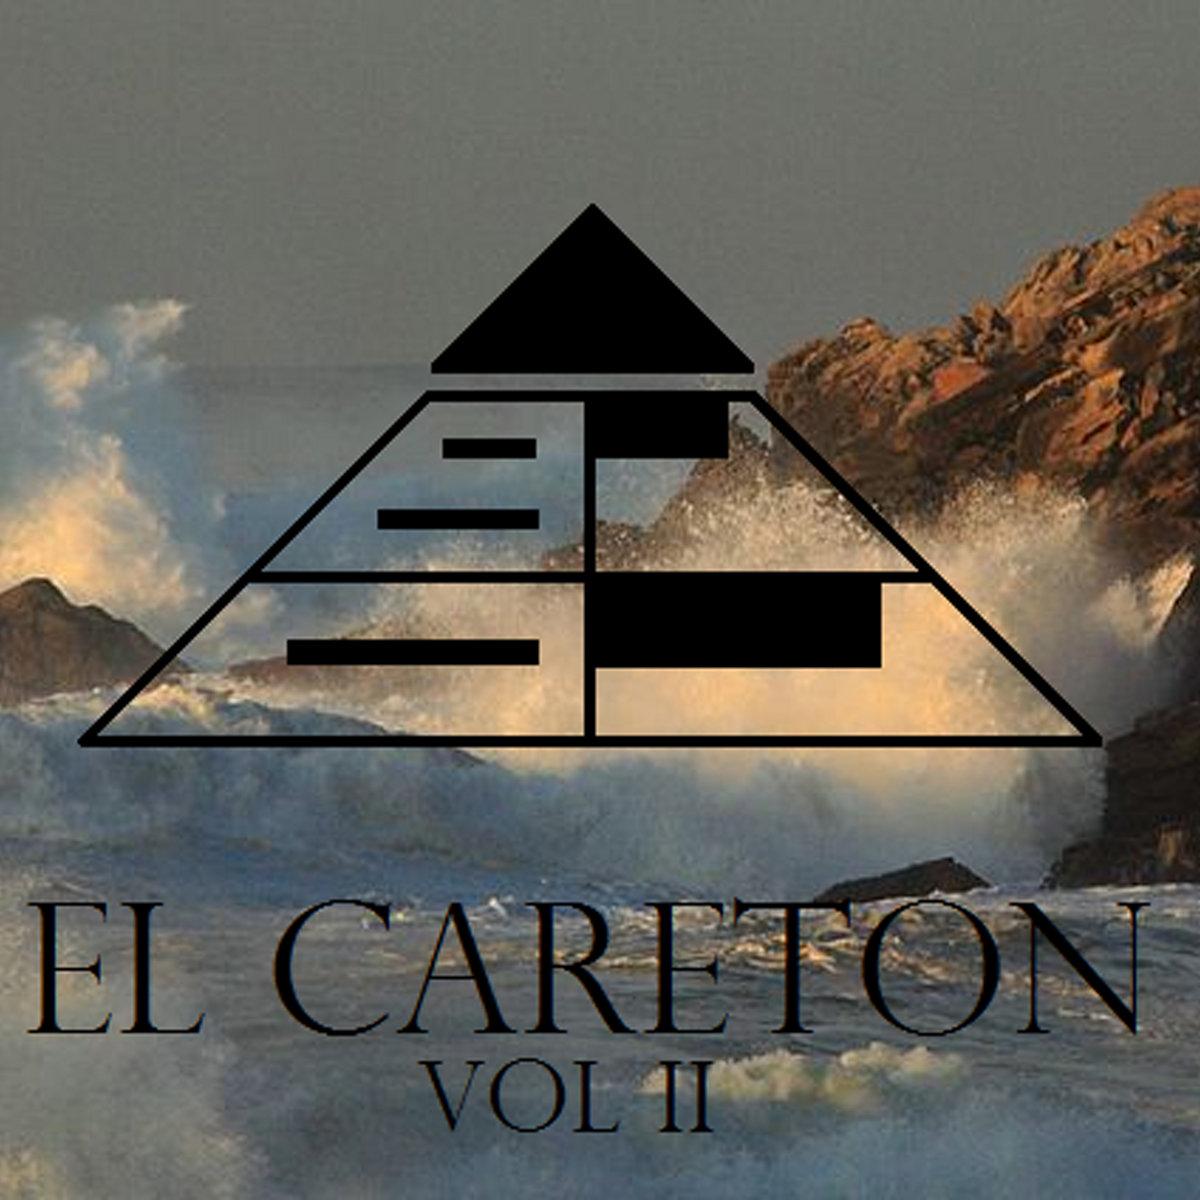 Lea in the Mix vs Migos | Cassette Blog